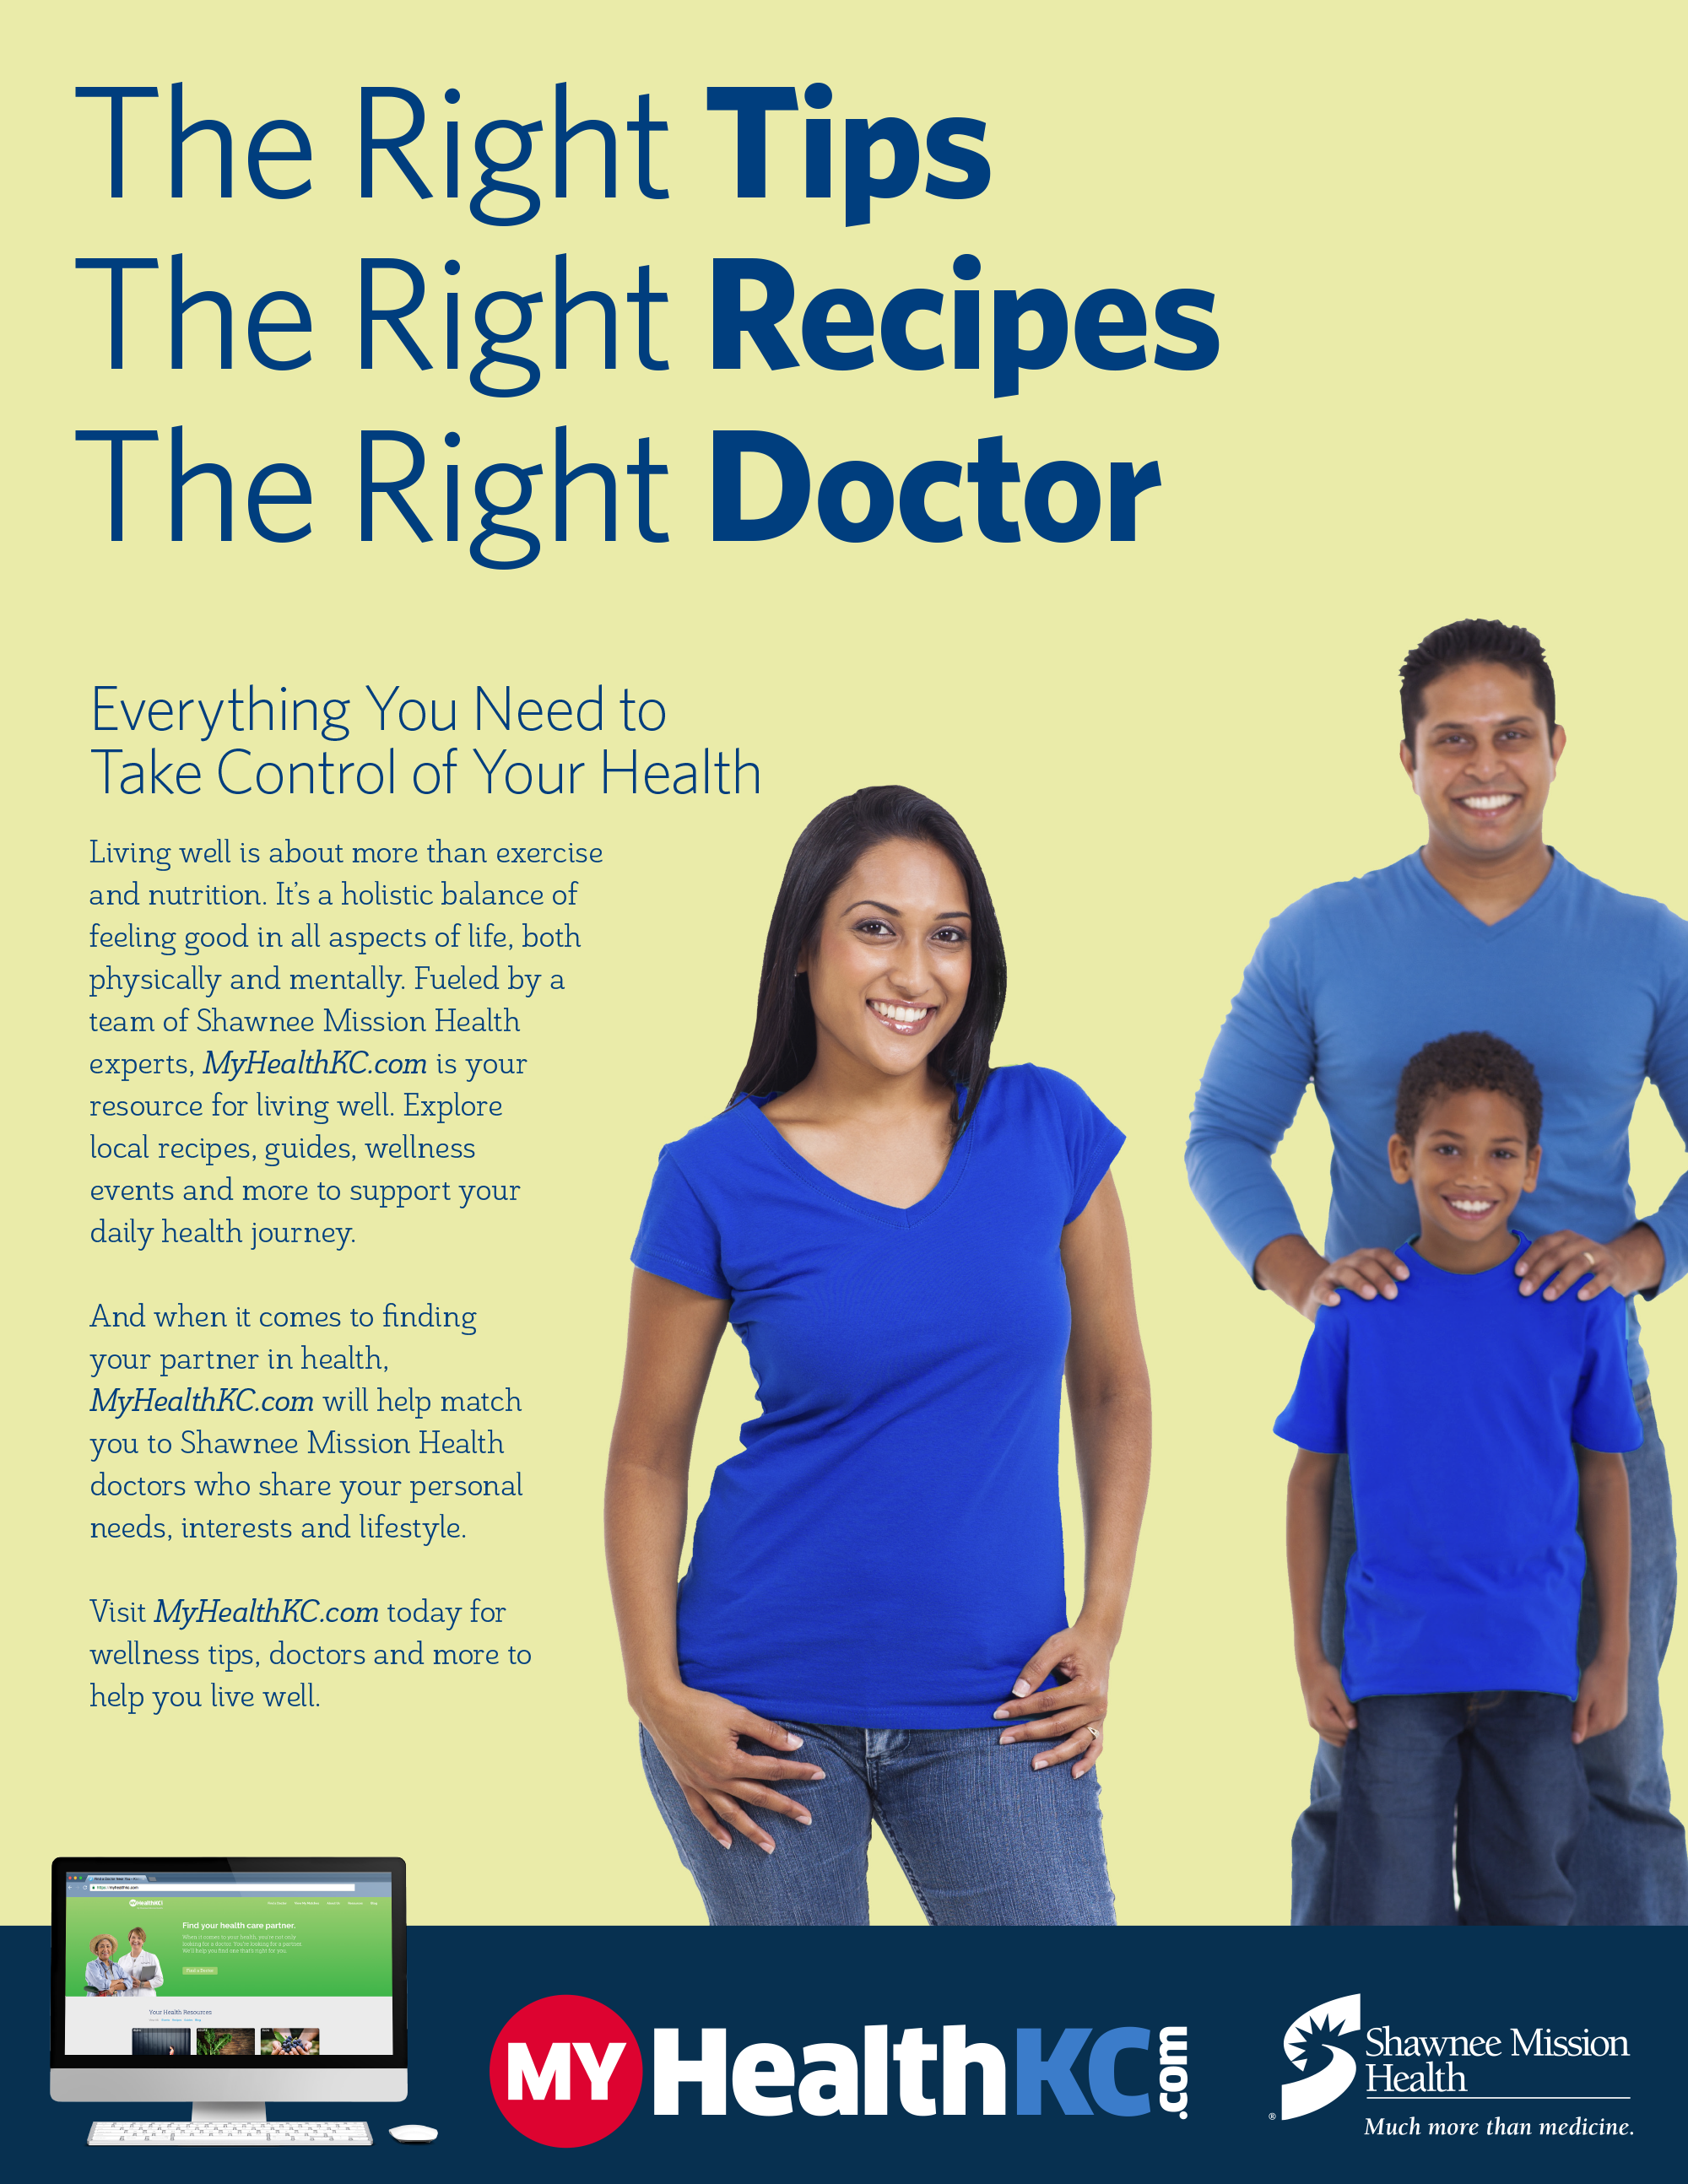 Shawnee Mission Health ad